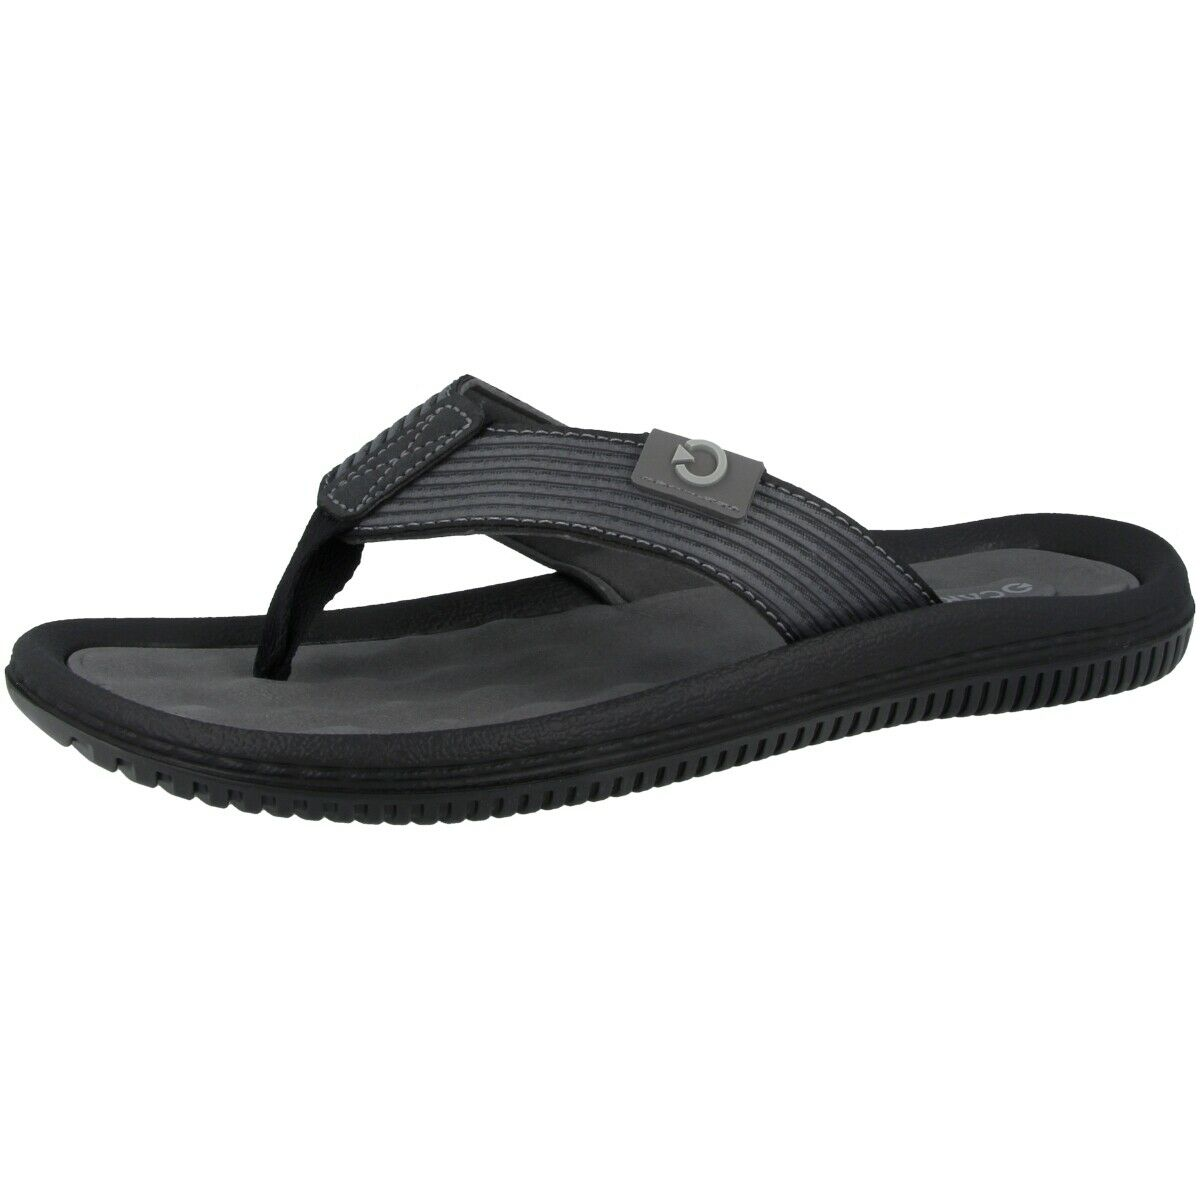 Cartago Rider Dunas (Vi ) ad Toe post shoes Sandals Bath Slippers 82614-8067